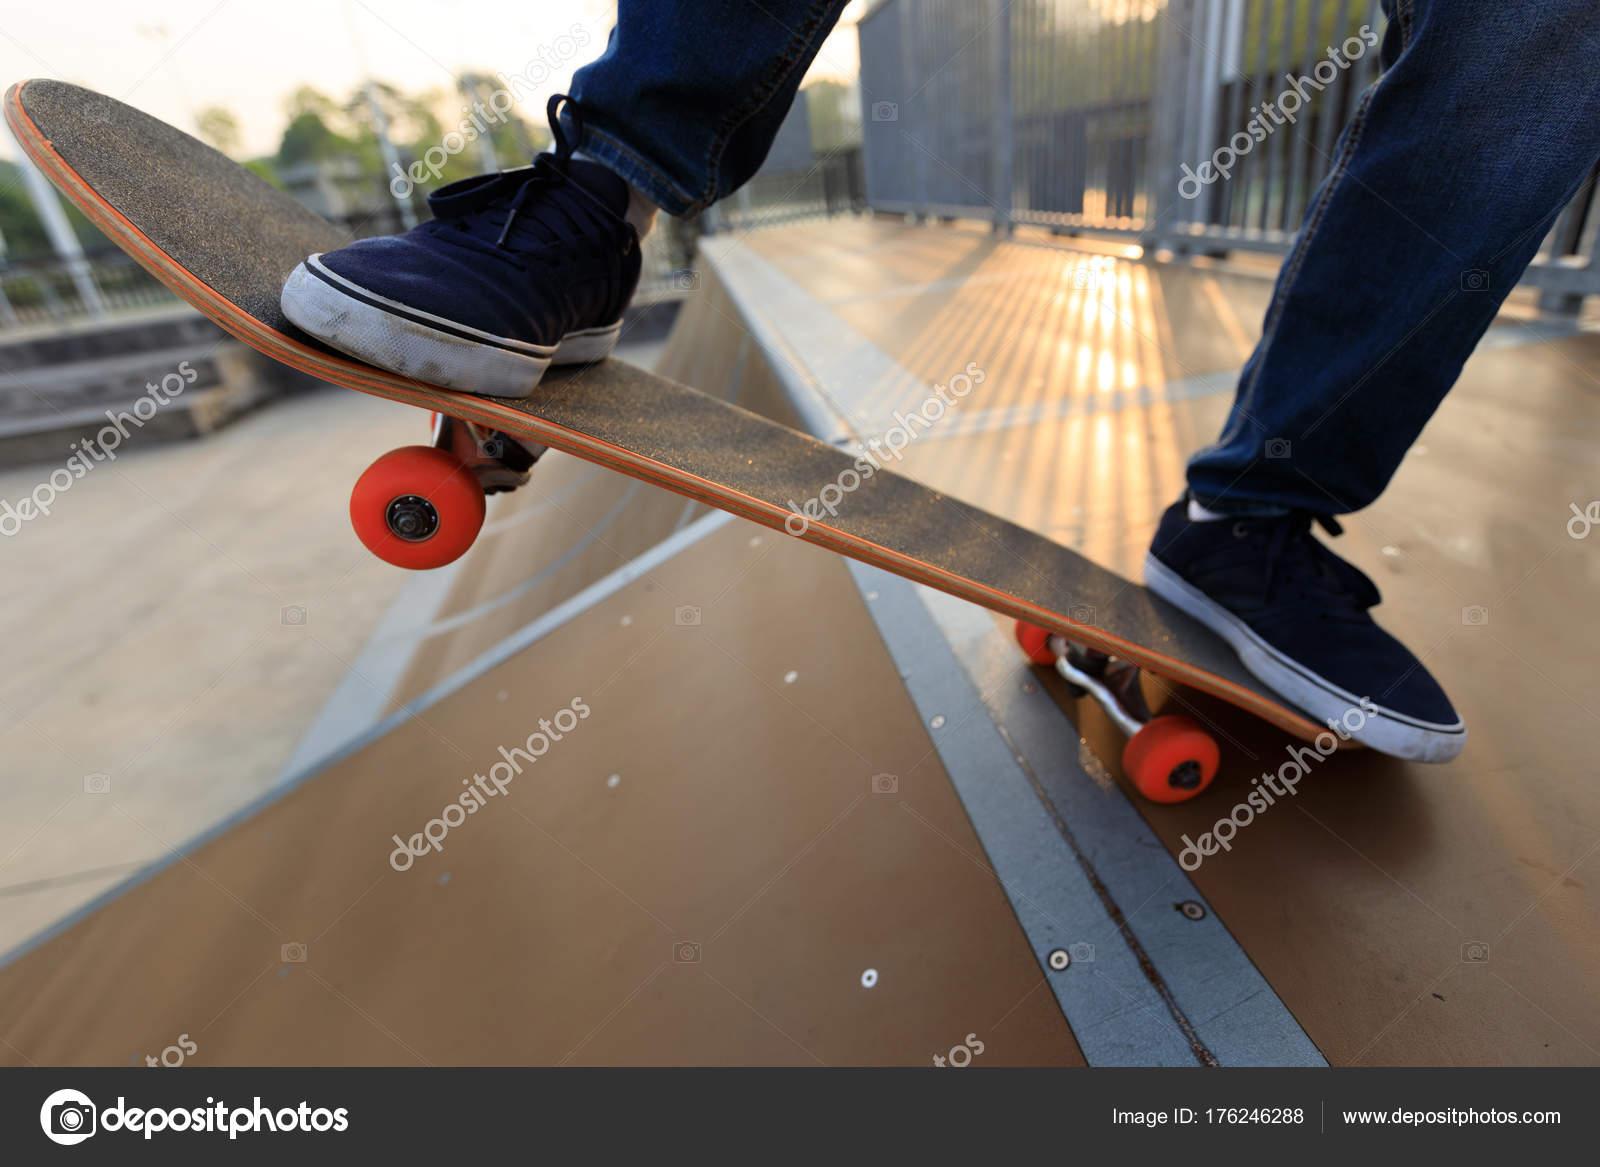 Skateboarder Beine Auf Skatepark Rampe Skateboard Stockfoto C Lzf